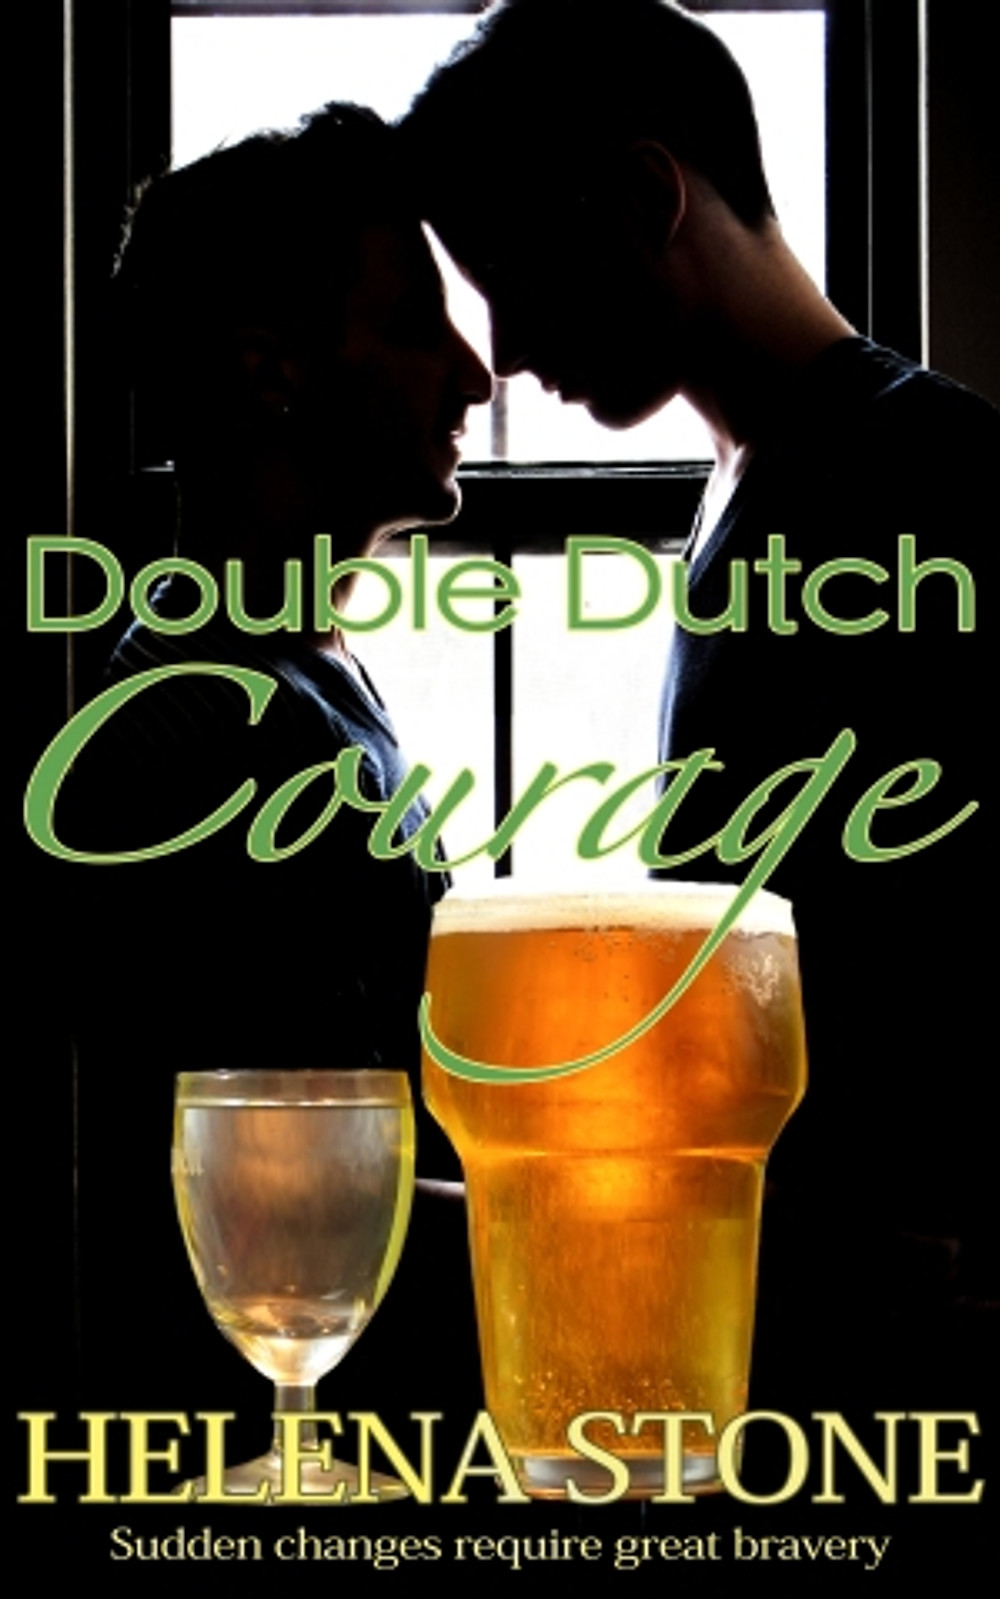 Double Dutch Courage (1563x2500px)